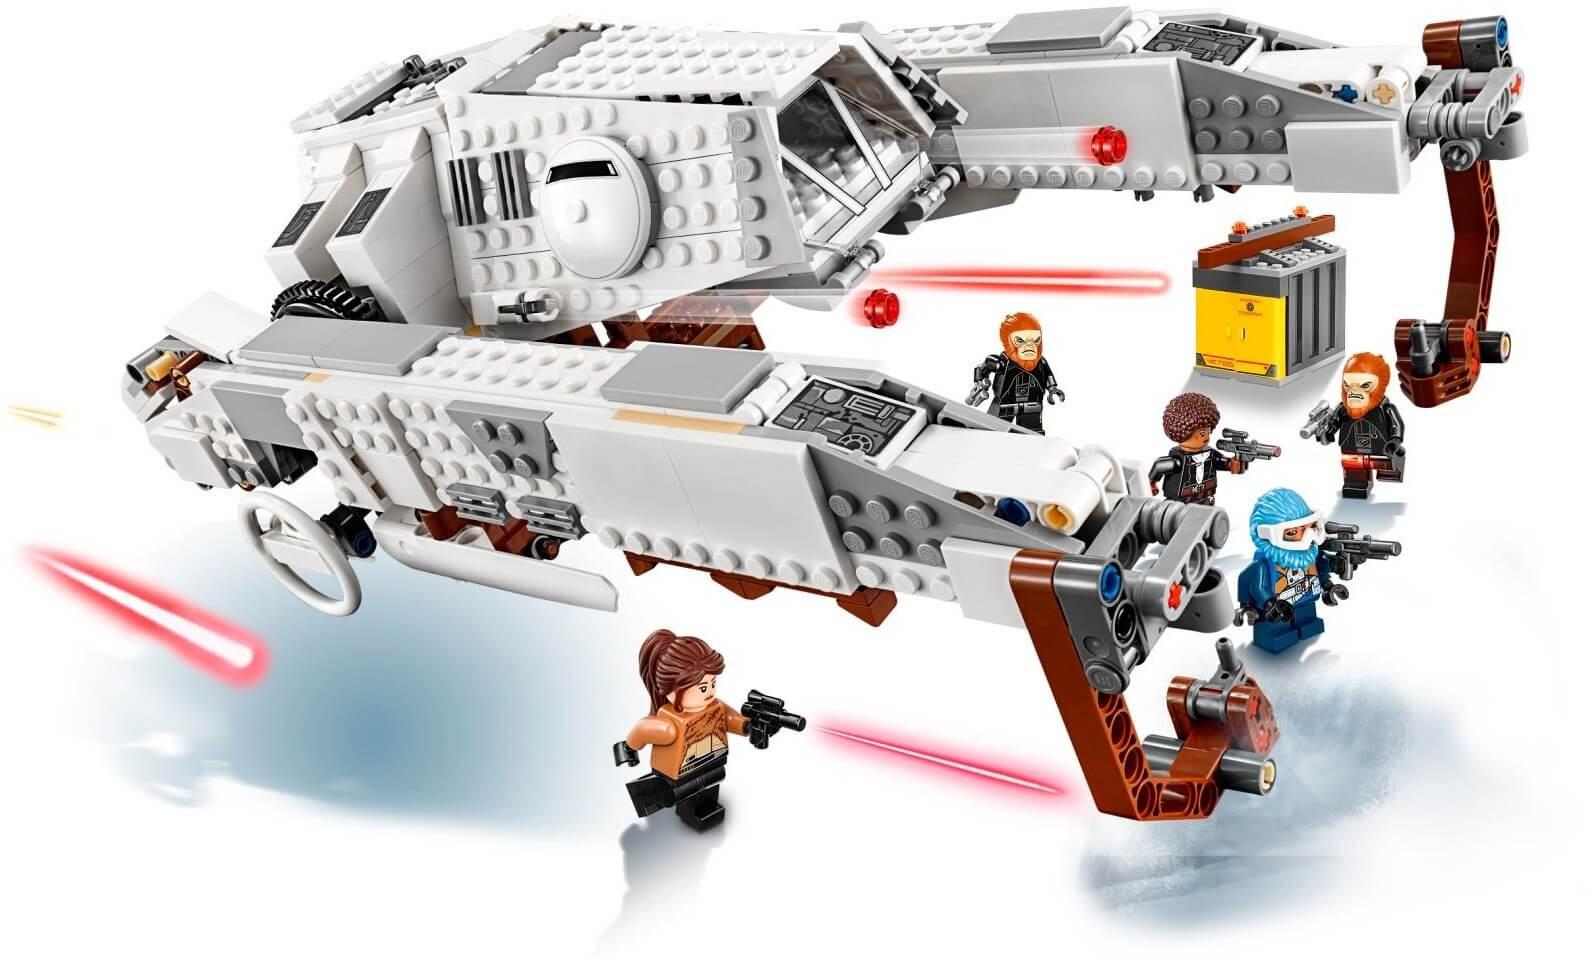 Mua đồ chơi LEGO 75219 - LEGO Star Wars 75219 - Phi Thuyền Chở Hàng AT-Hauler (LEGO 75219 Imperial AT-Hauler)